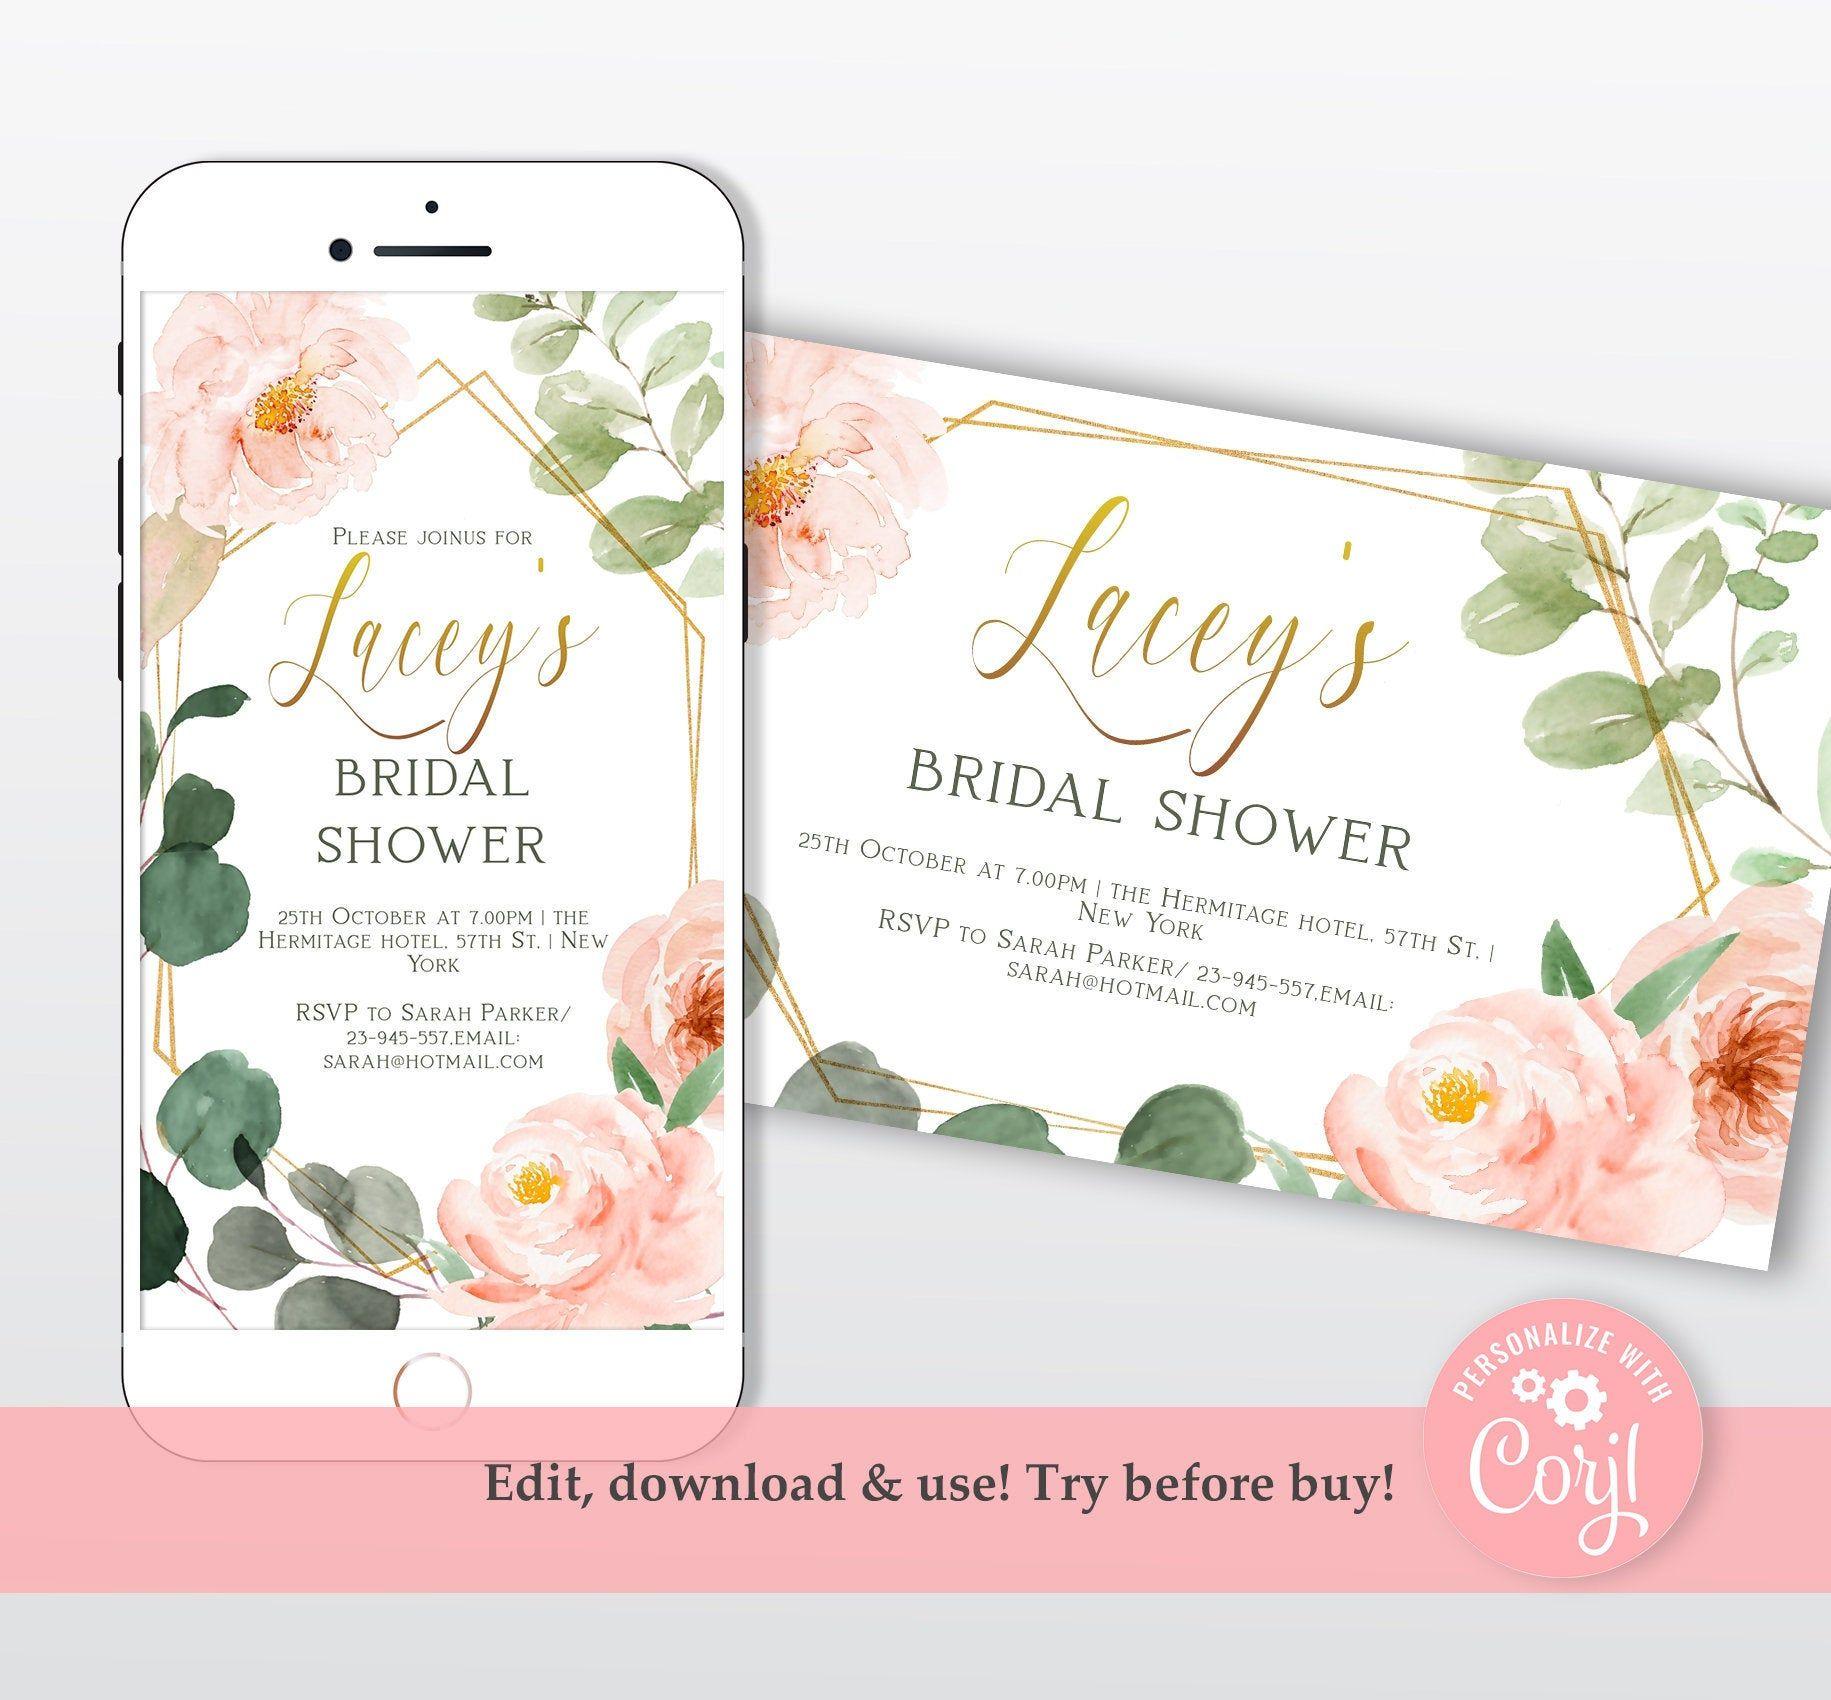 Blush and Gold Bridal Shower Facebook Event Cover Banner Invitation Editable Bridal Shower Social Media Event Photo Digital Invitation Evite